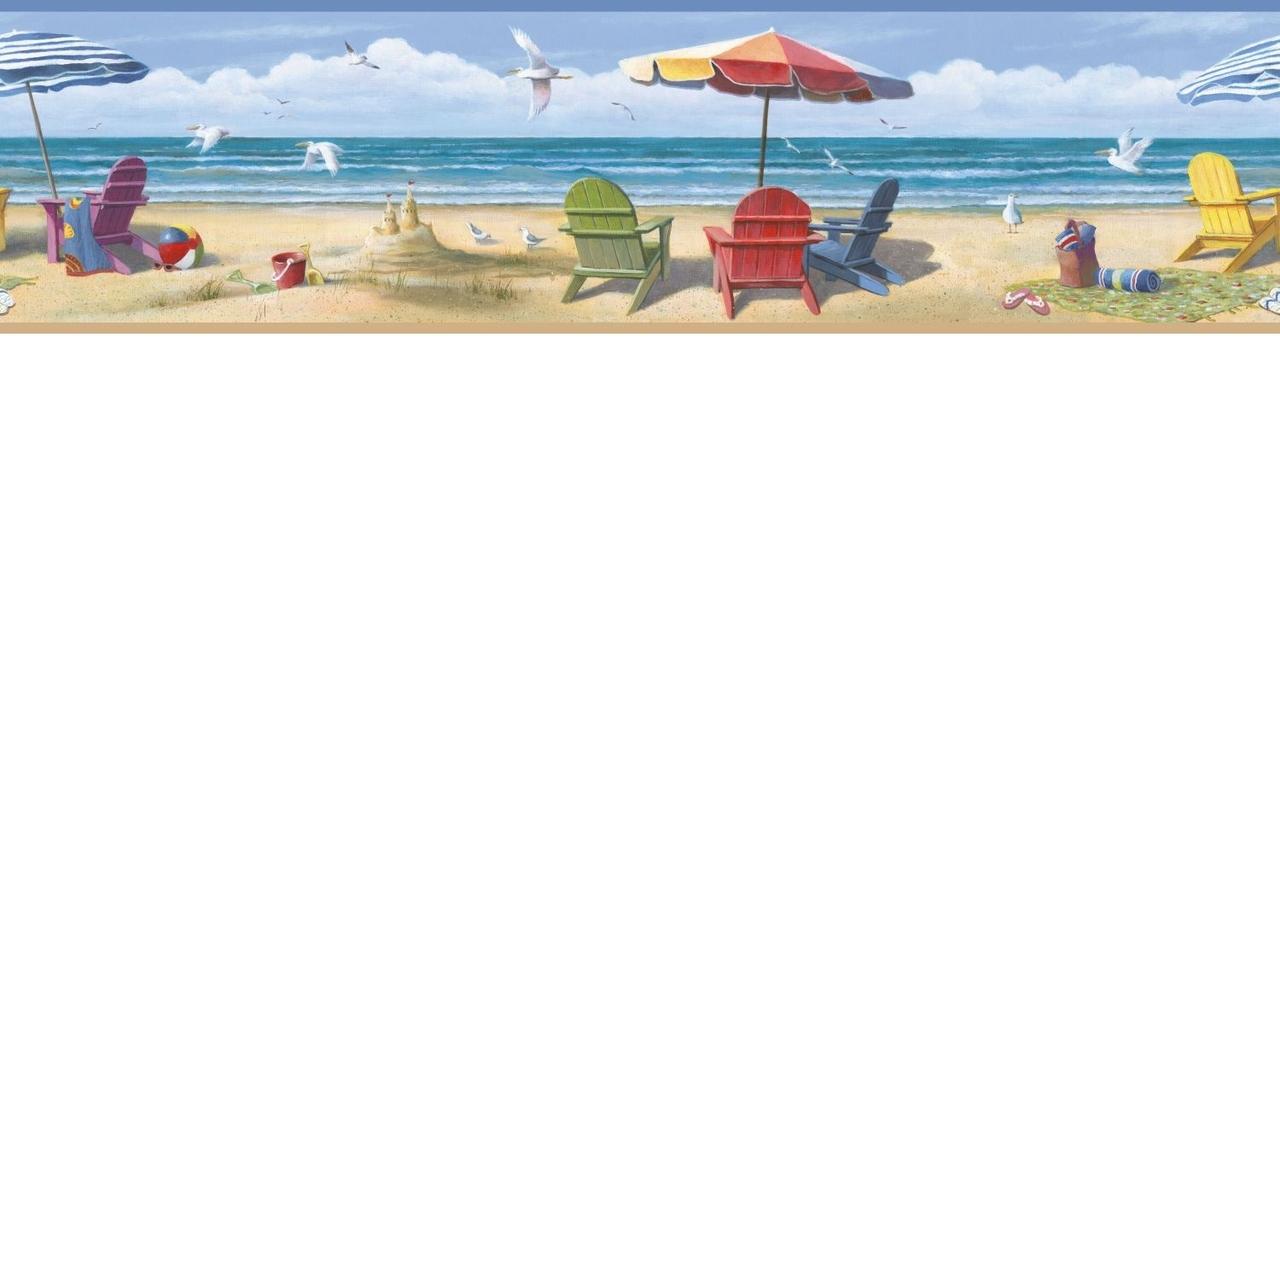 Coastal Waters Volume II Beach Summer at the Beach Wallpaper Border 1280x1280